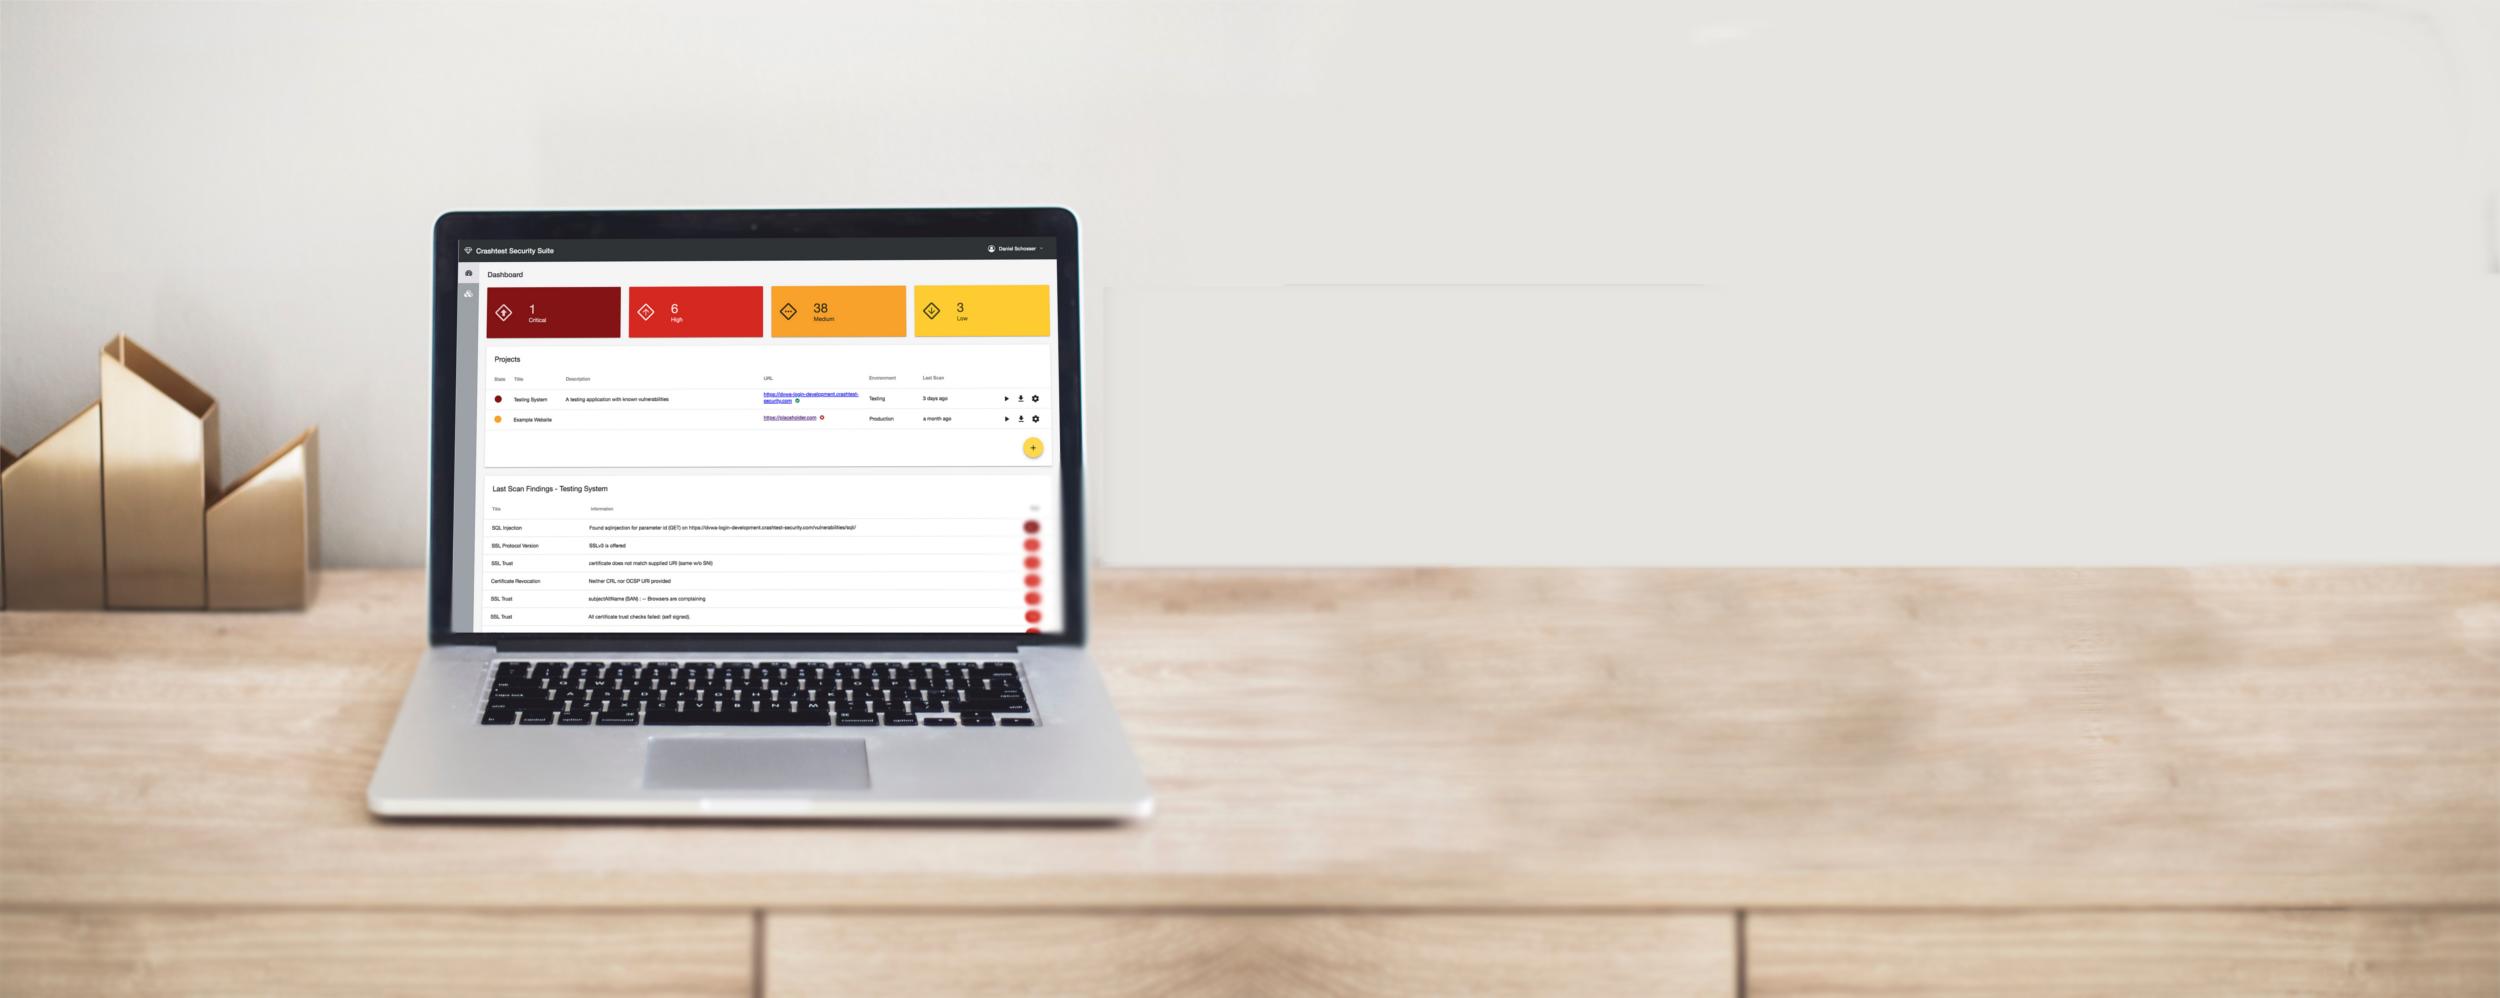 Chrashtest Security Vulnerability Assessment Tool showcased in a laptop screen